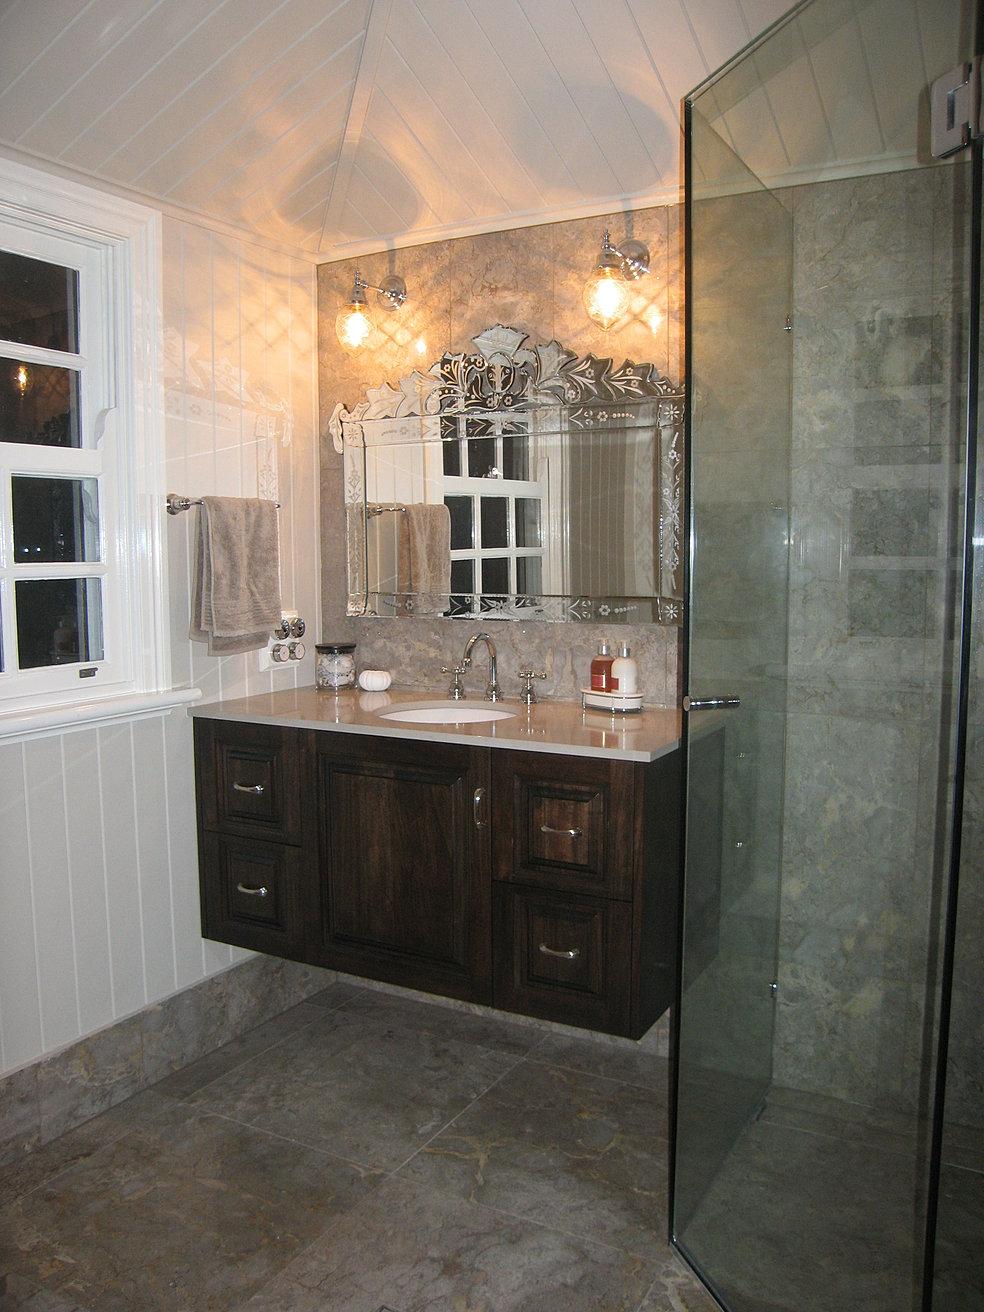 Bathroom Renovations South Brisbane: Craig Rynne Constructions